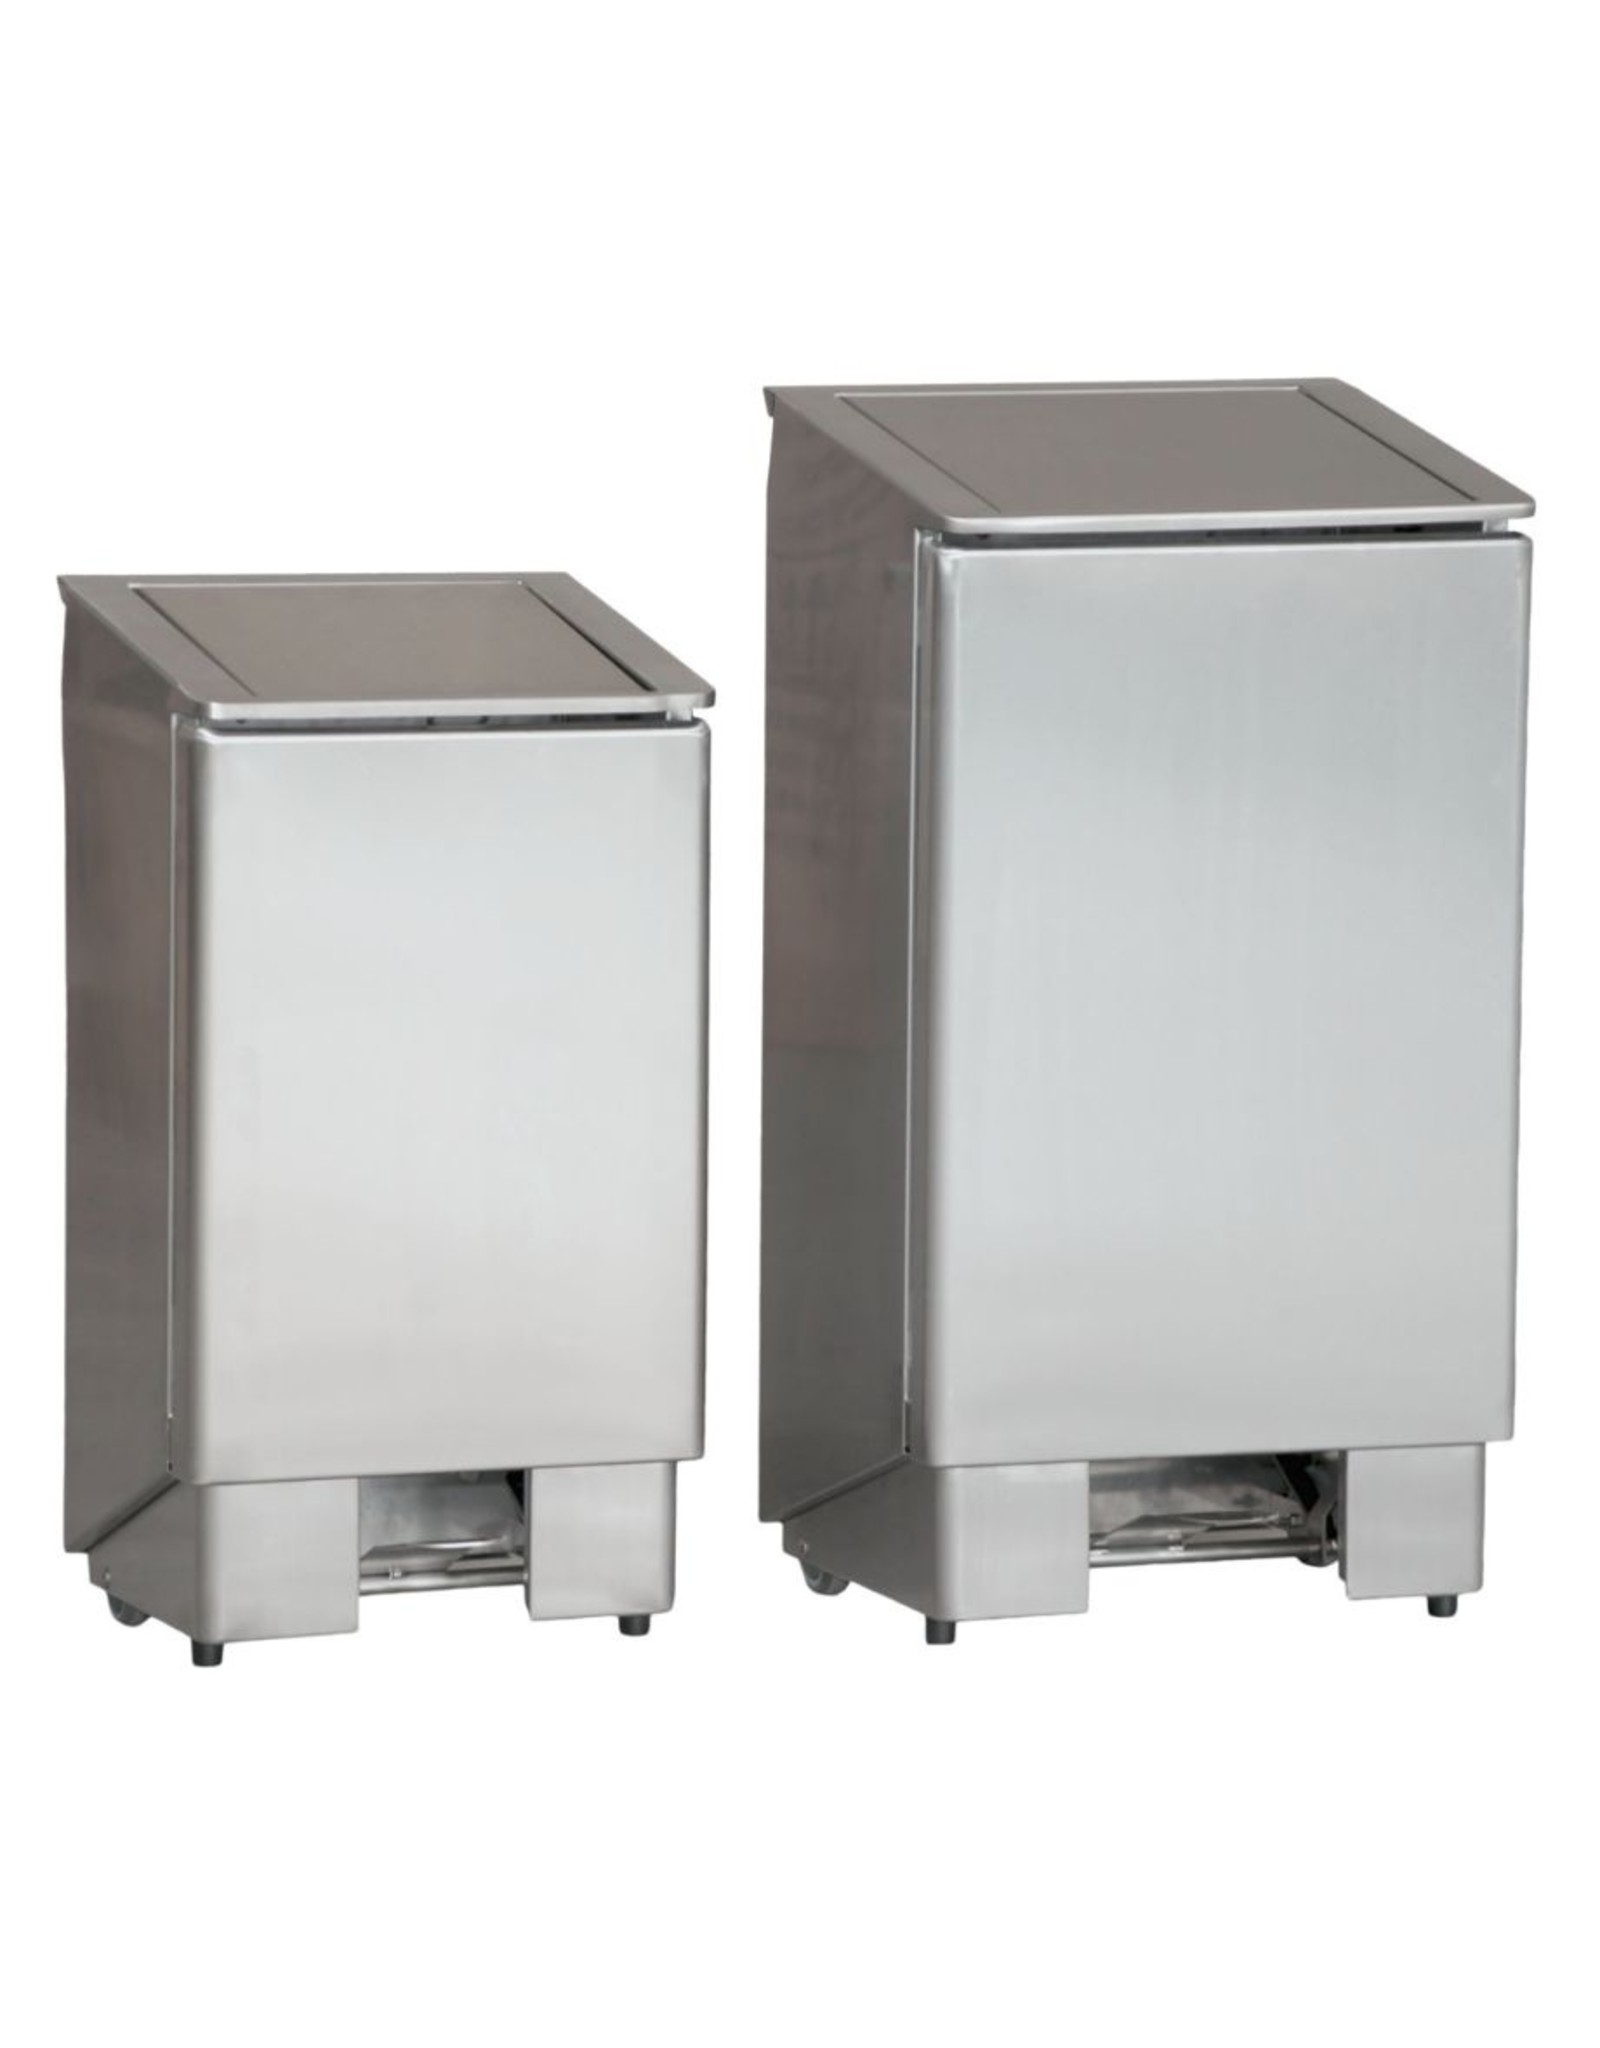 RVS afvalbak met voetpedaal | 90L | (H)91x(B)39,4x(D)36,5cm